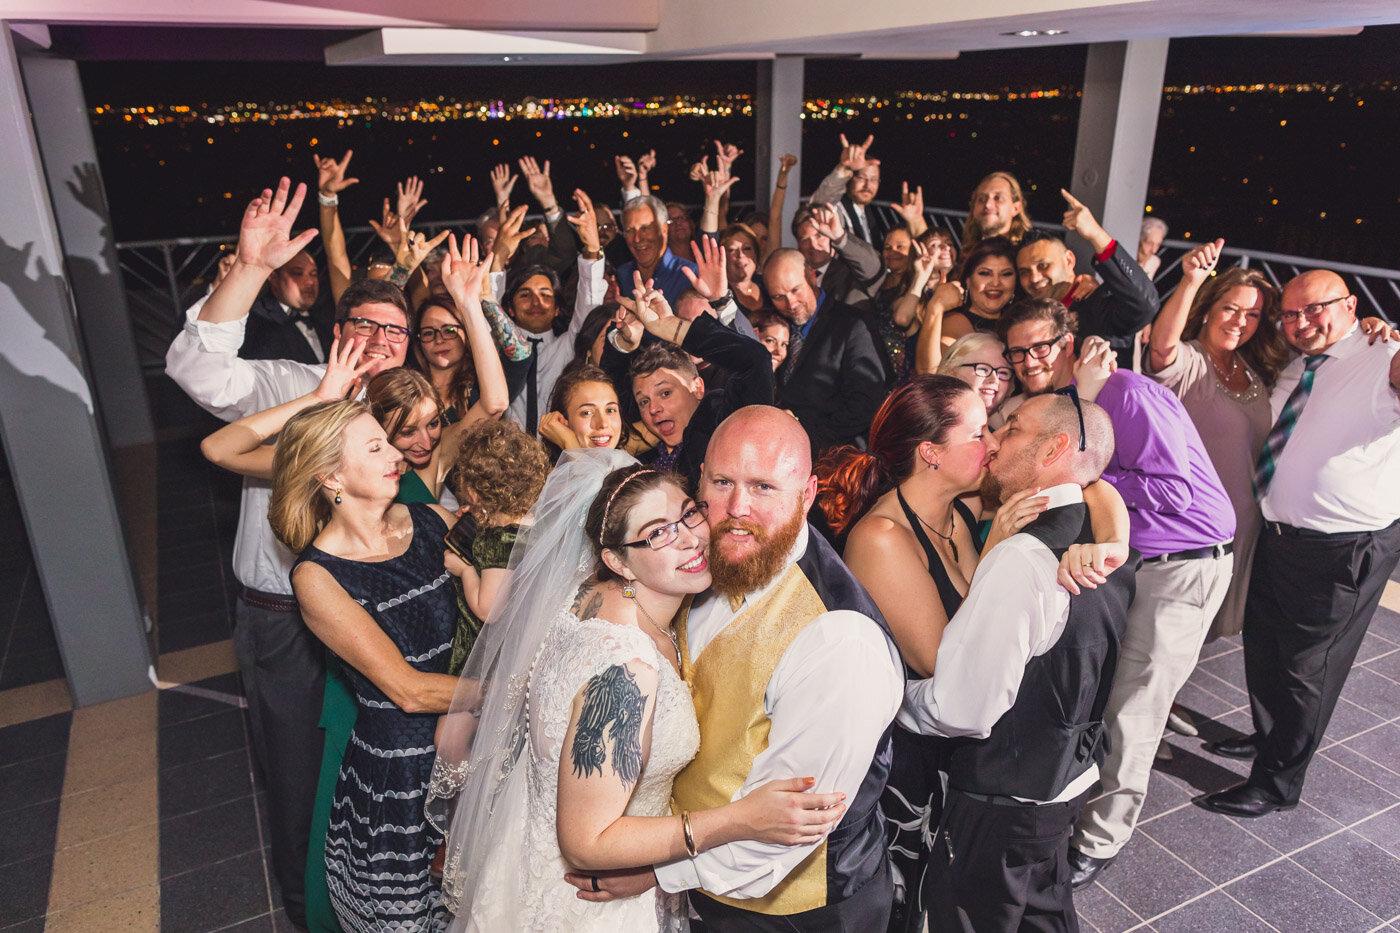 large-wedding-group-photo-at-reception